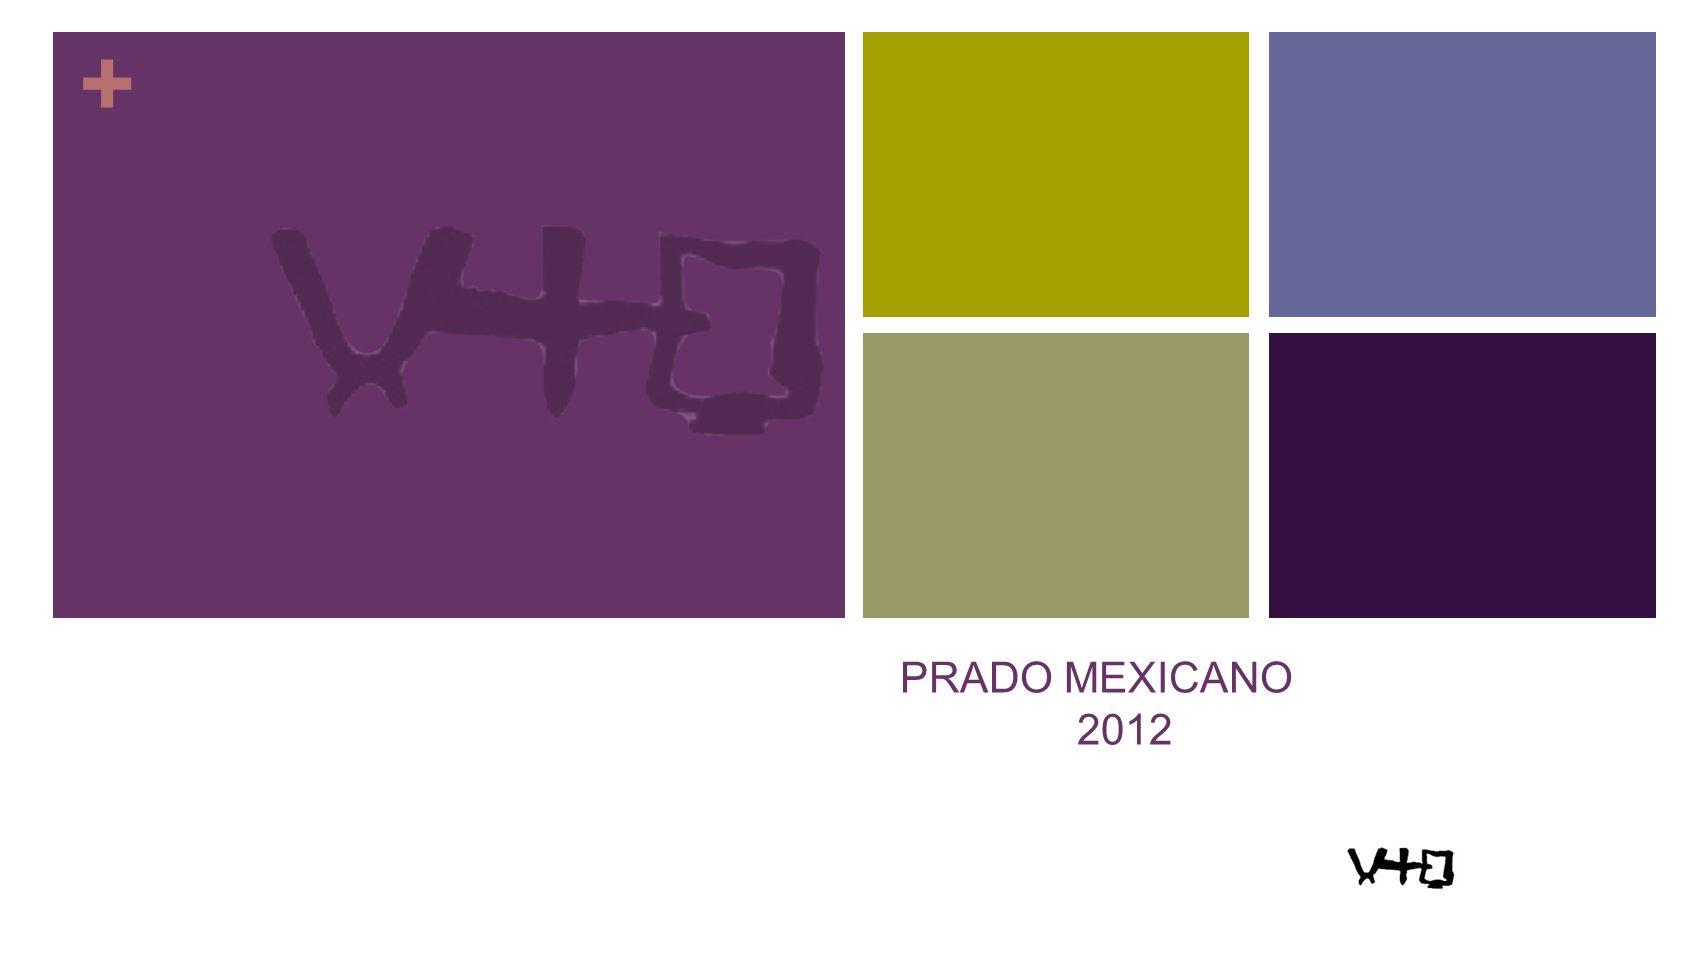 + PRADO MEXICANO 2012